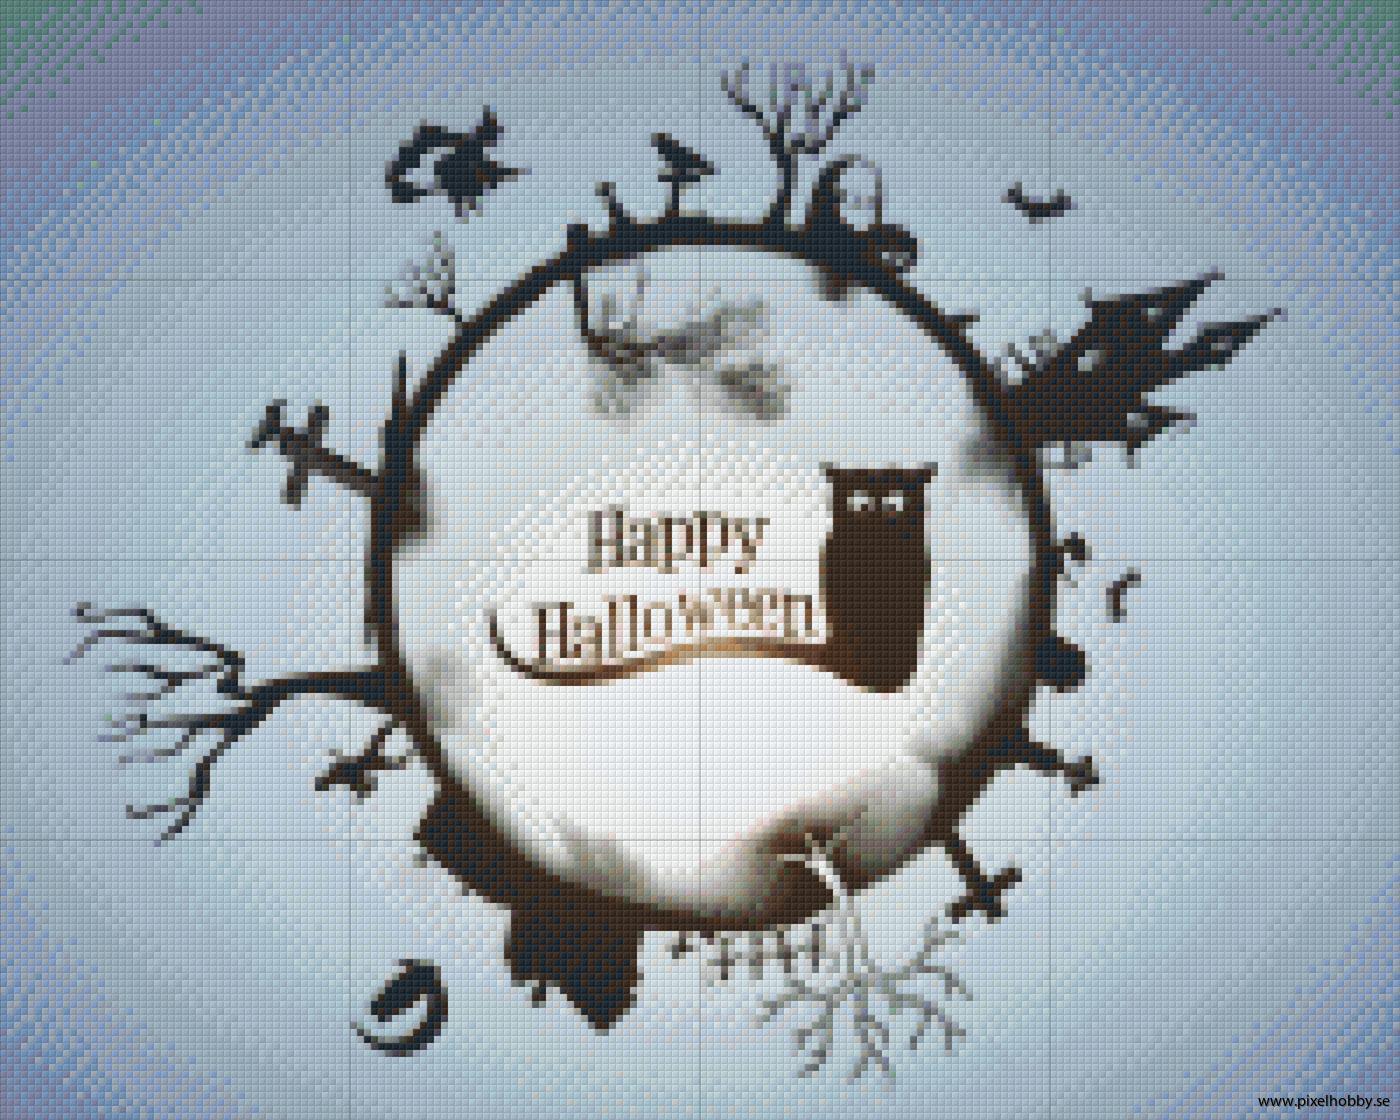 Happy Halloween_2 16 rbp